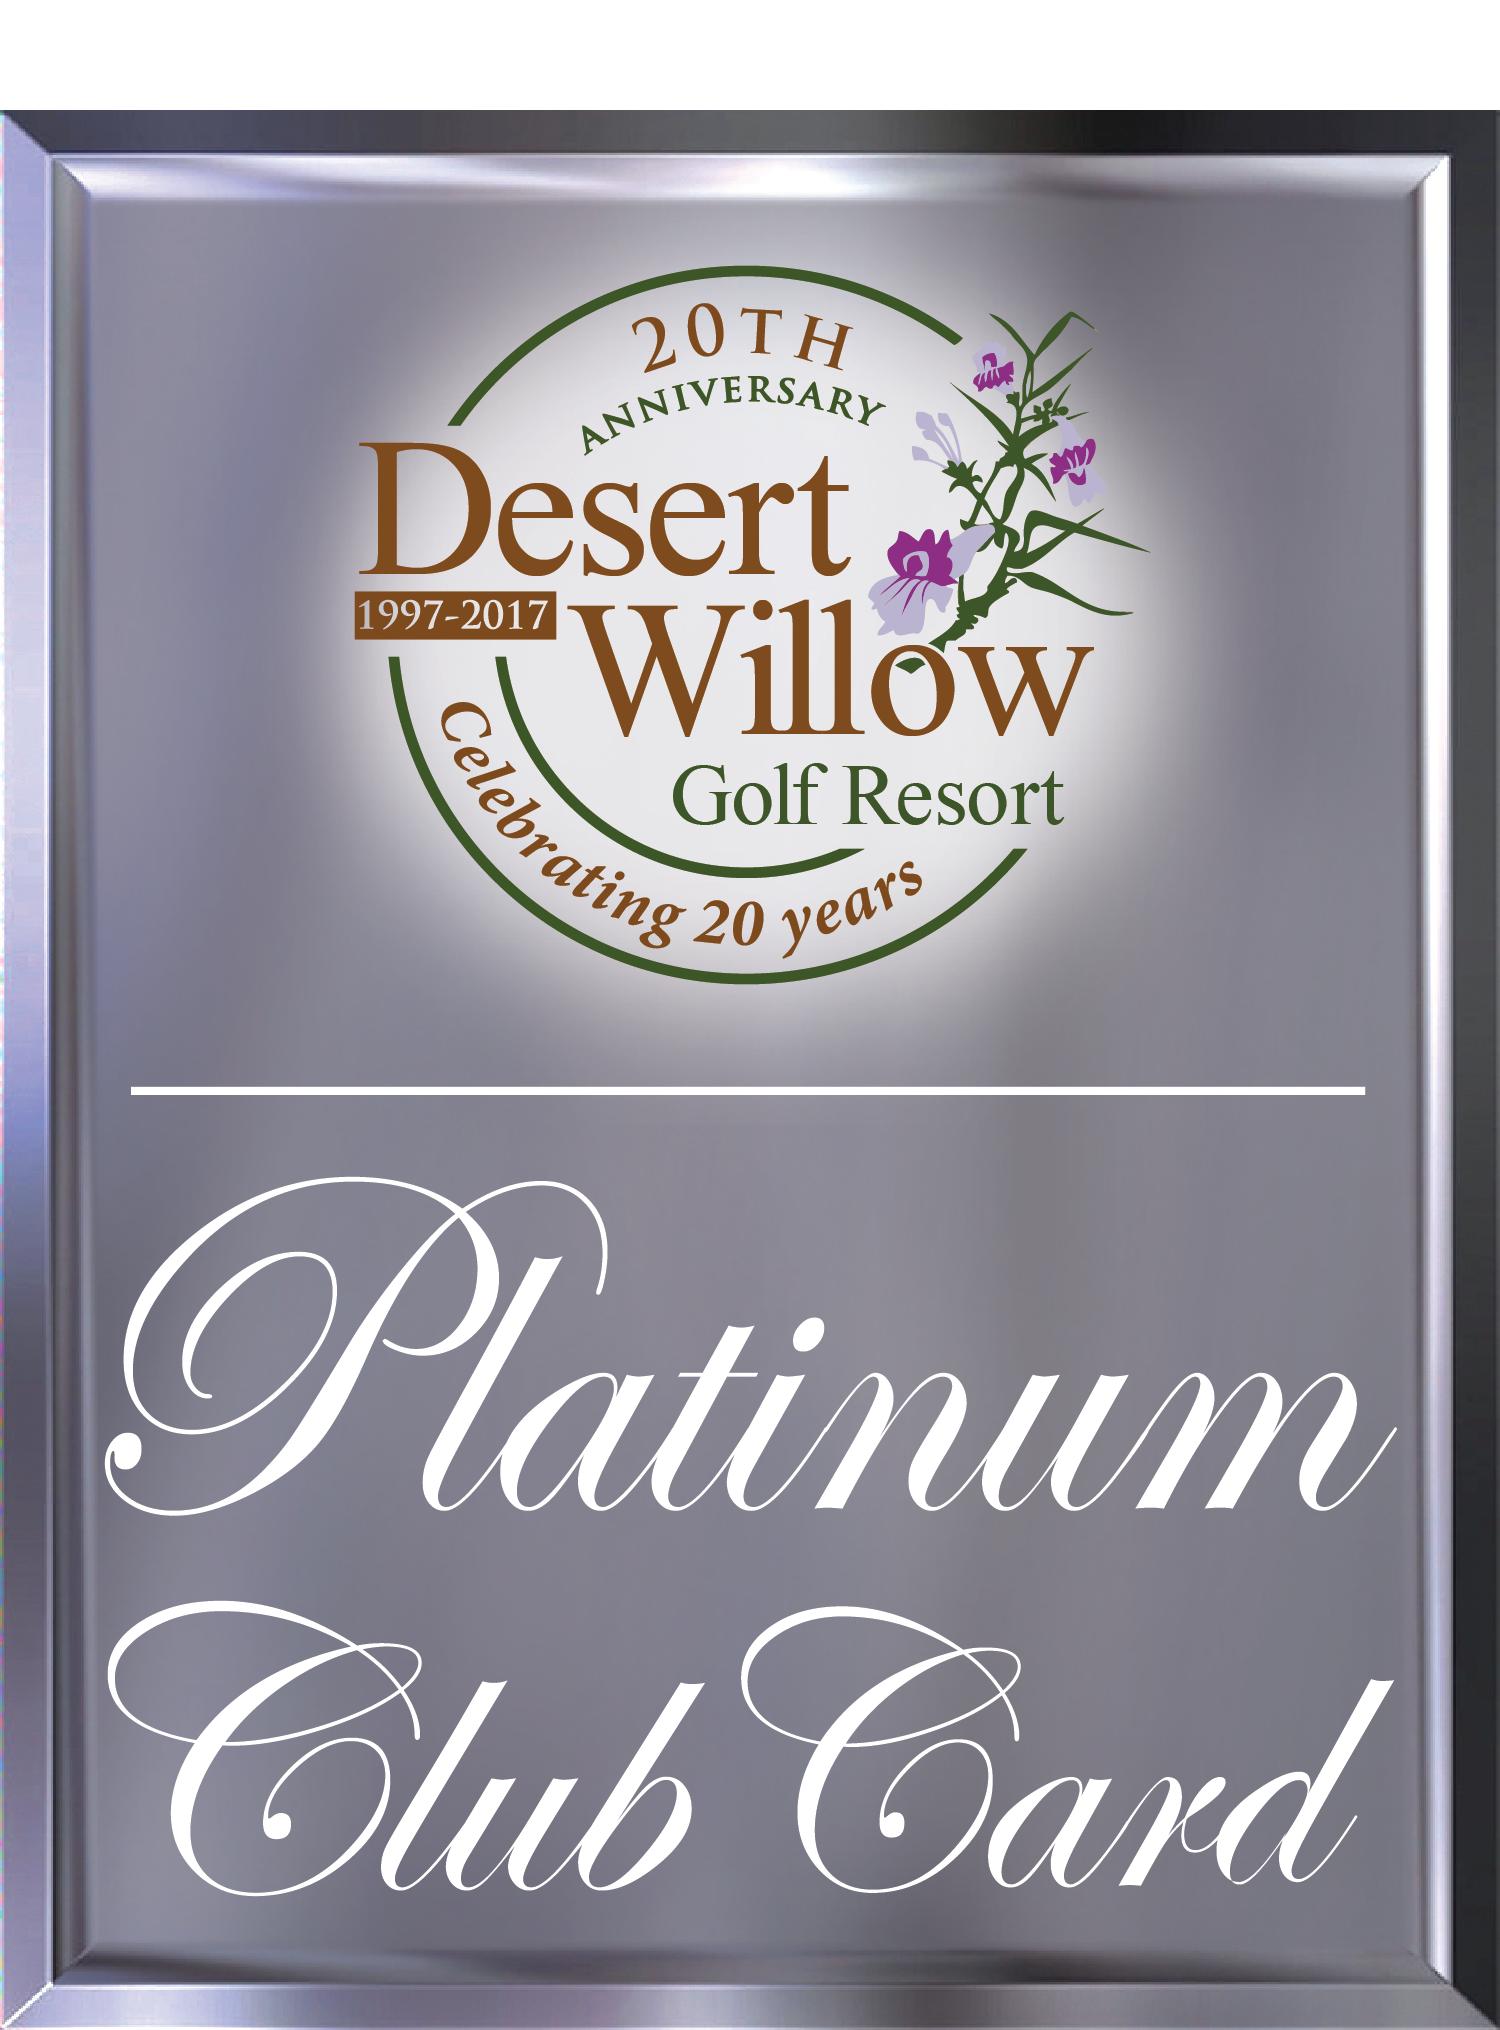 Desert Willow Platinum Club Cardholders's Logo